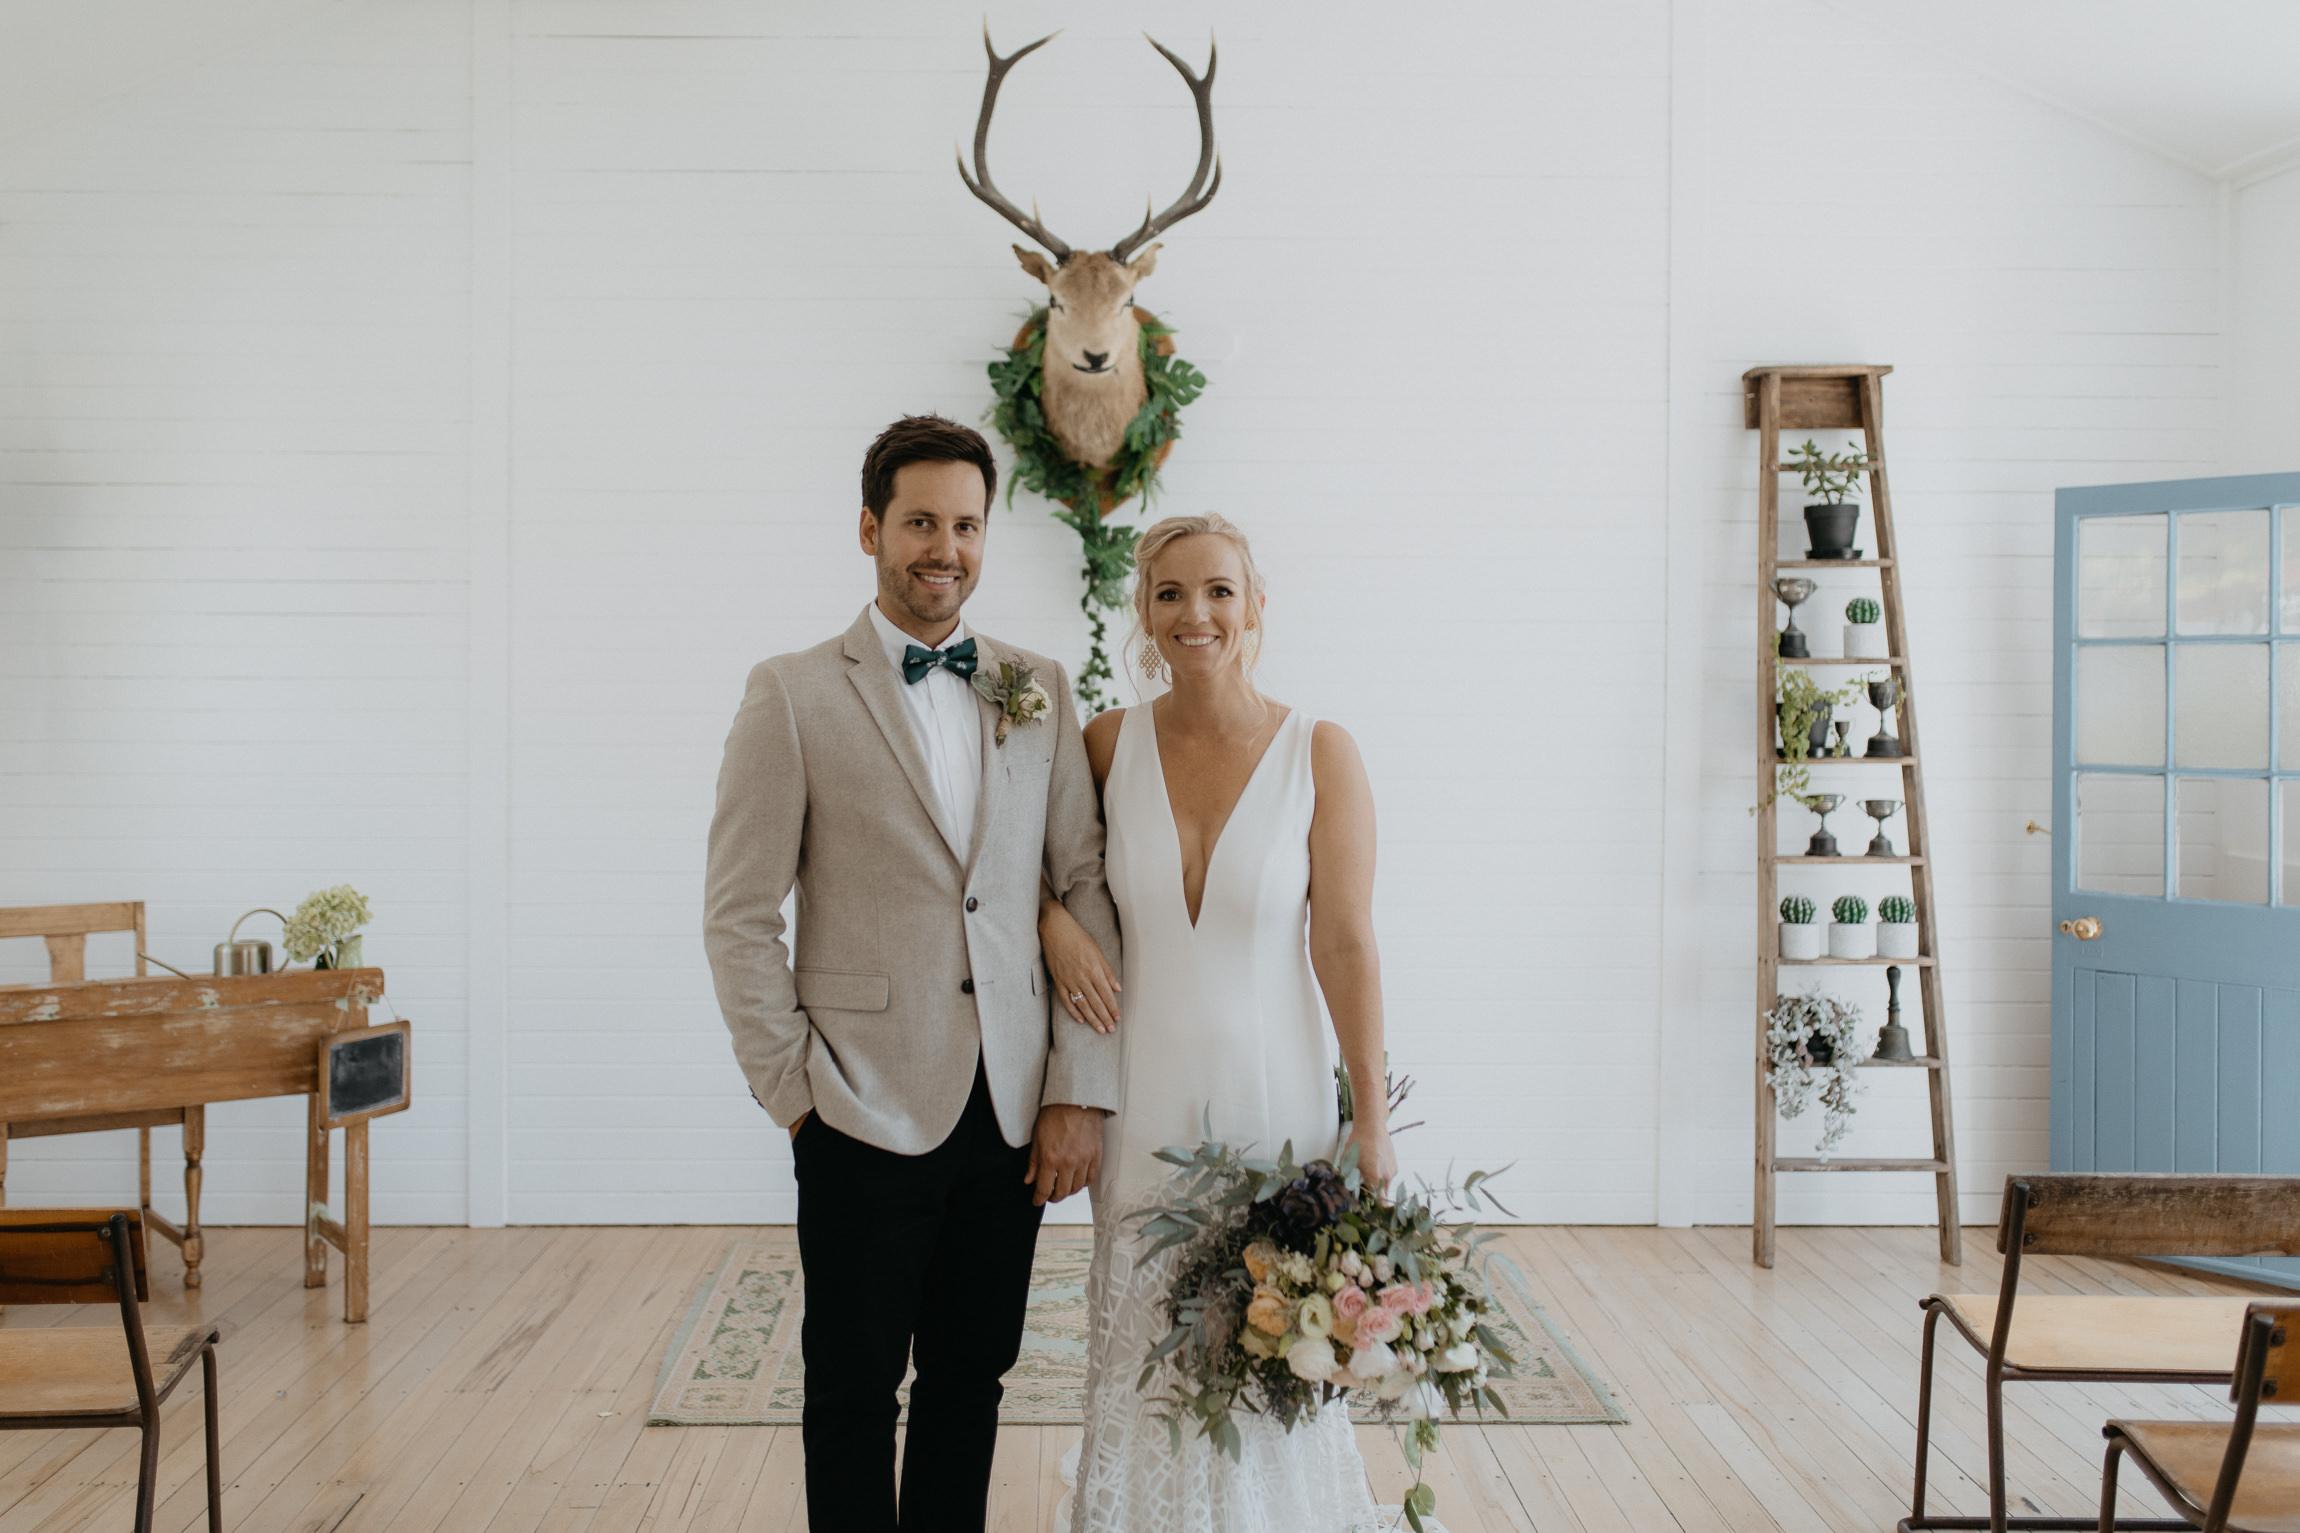 oldforestschool-wedding-blog-64.jpg